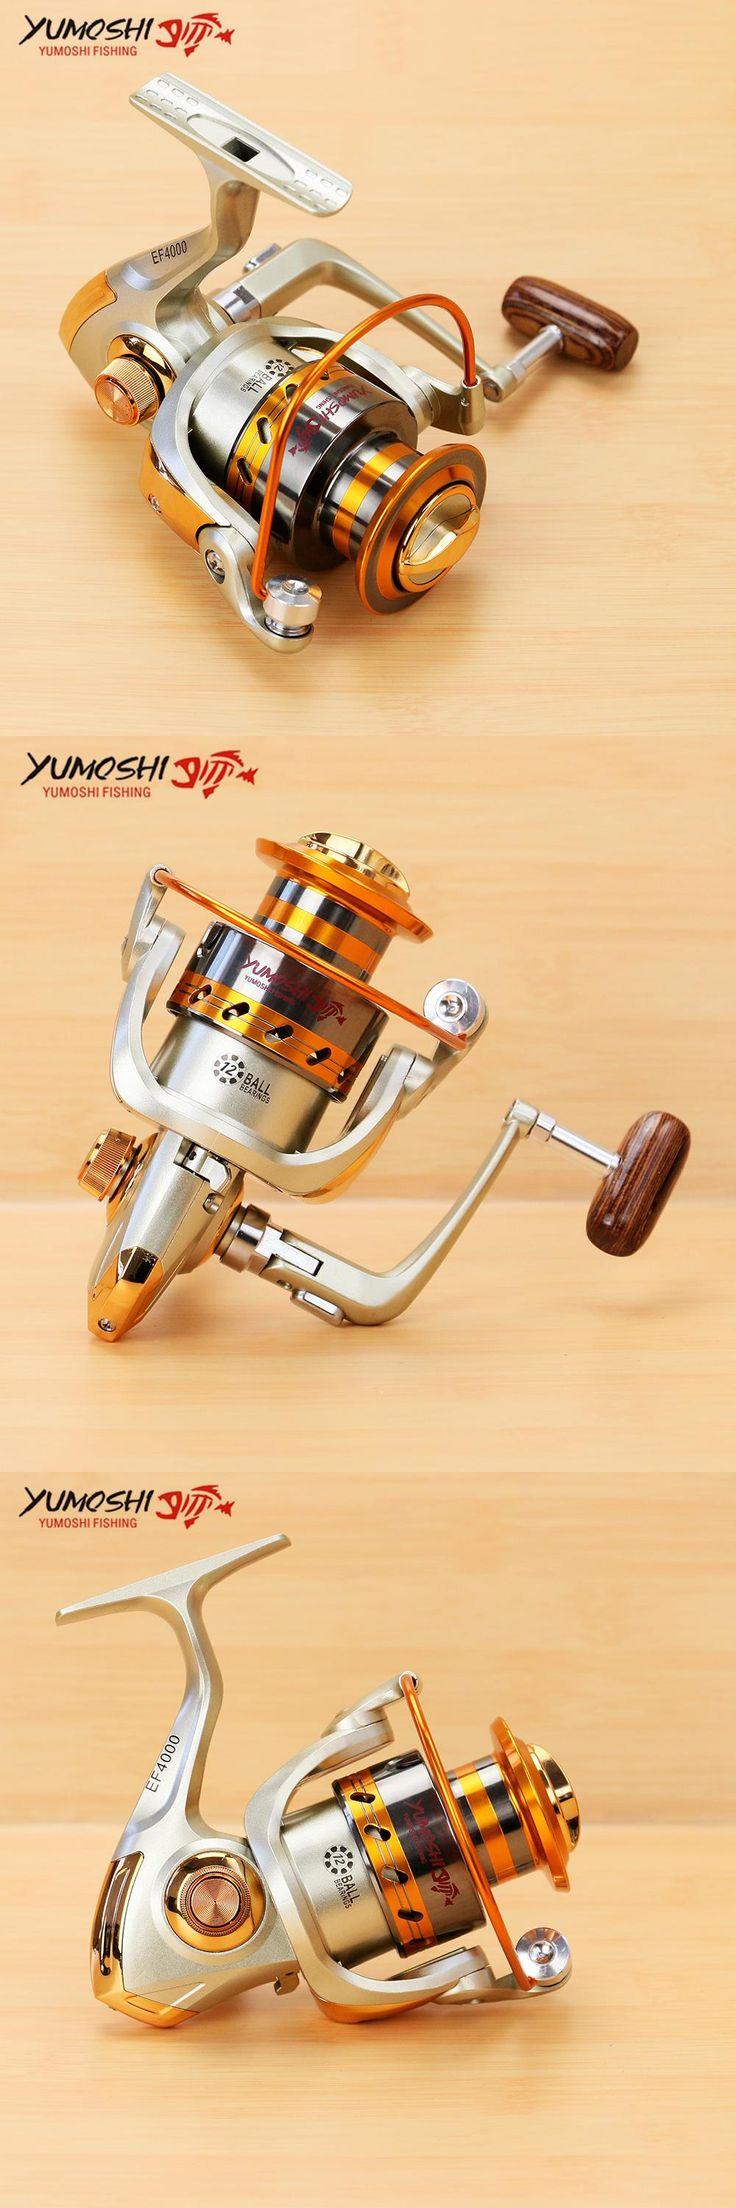 [Visit to Buy] Pesca Fishing Reel 12BB 5.2:1/4.1:1 Metal Spool Carretilhas de pecasaria Molinete para pesca Spinning Reel fishing accessories #Advertisement